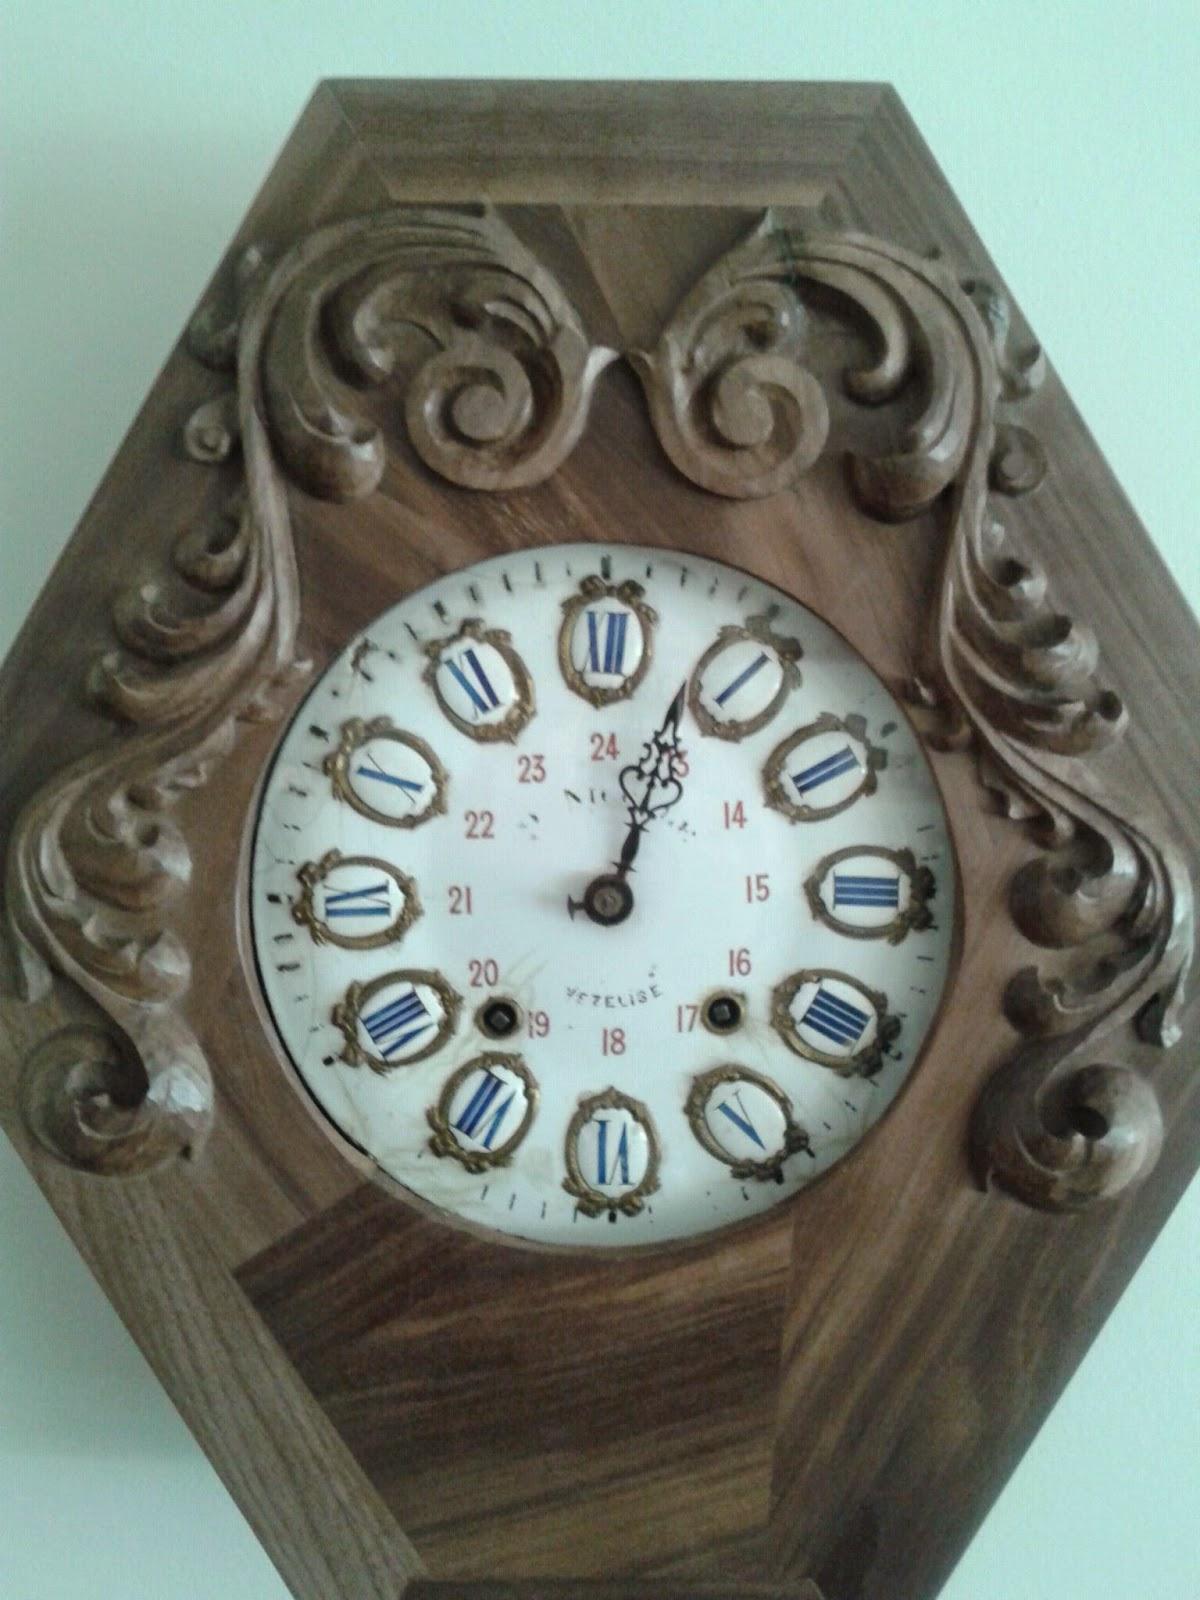 Reloj antiguo restaurado - Carpinteros en malaga ...